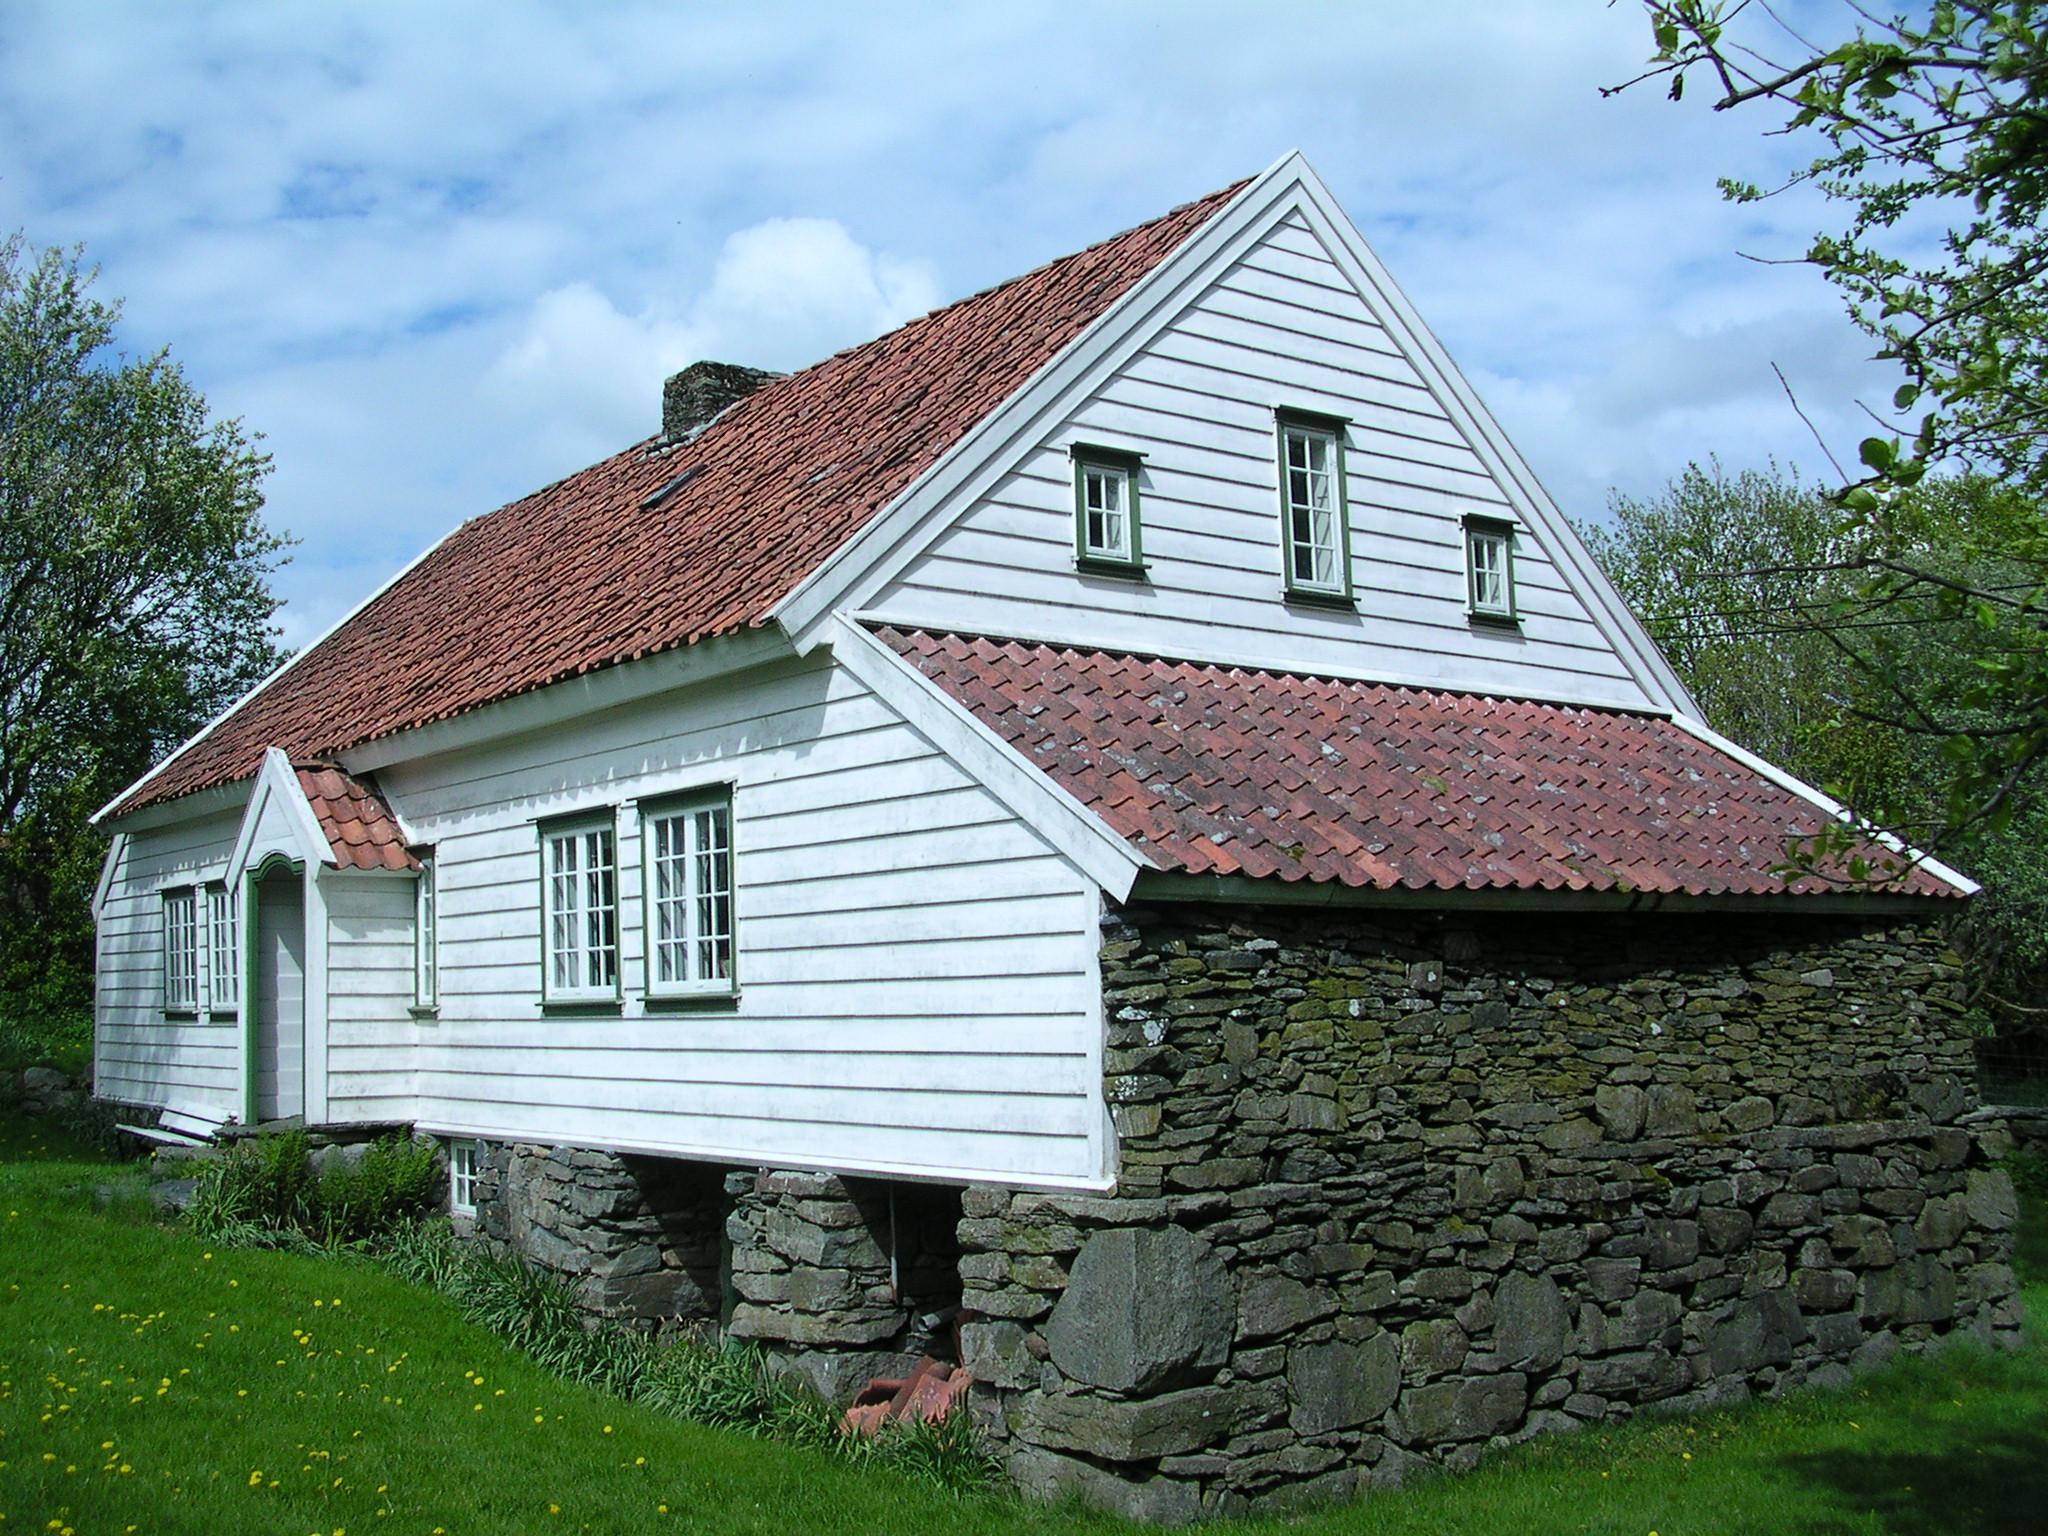 File:House at Jæren in Norway Garborgheimen.JPG - Wikimedia Commons